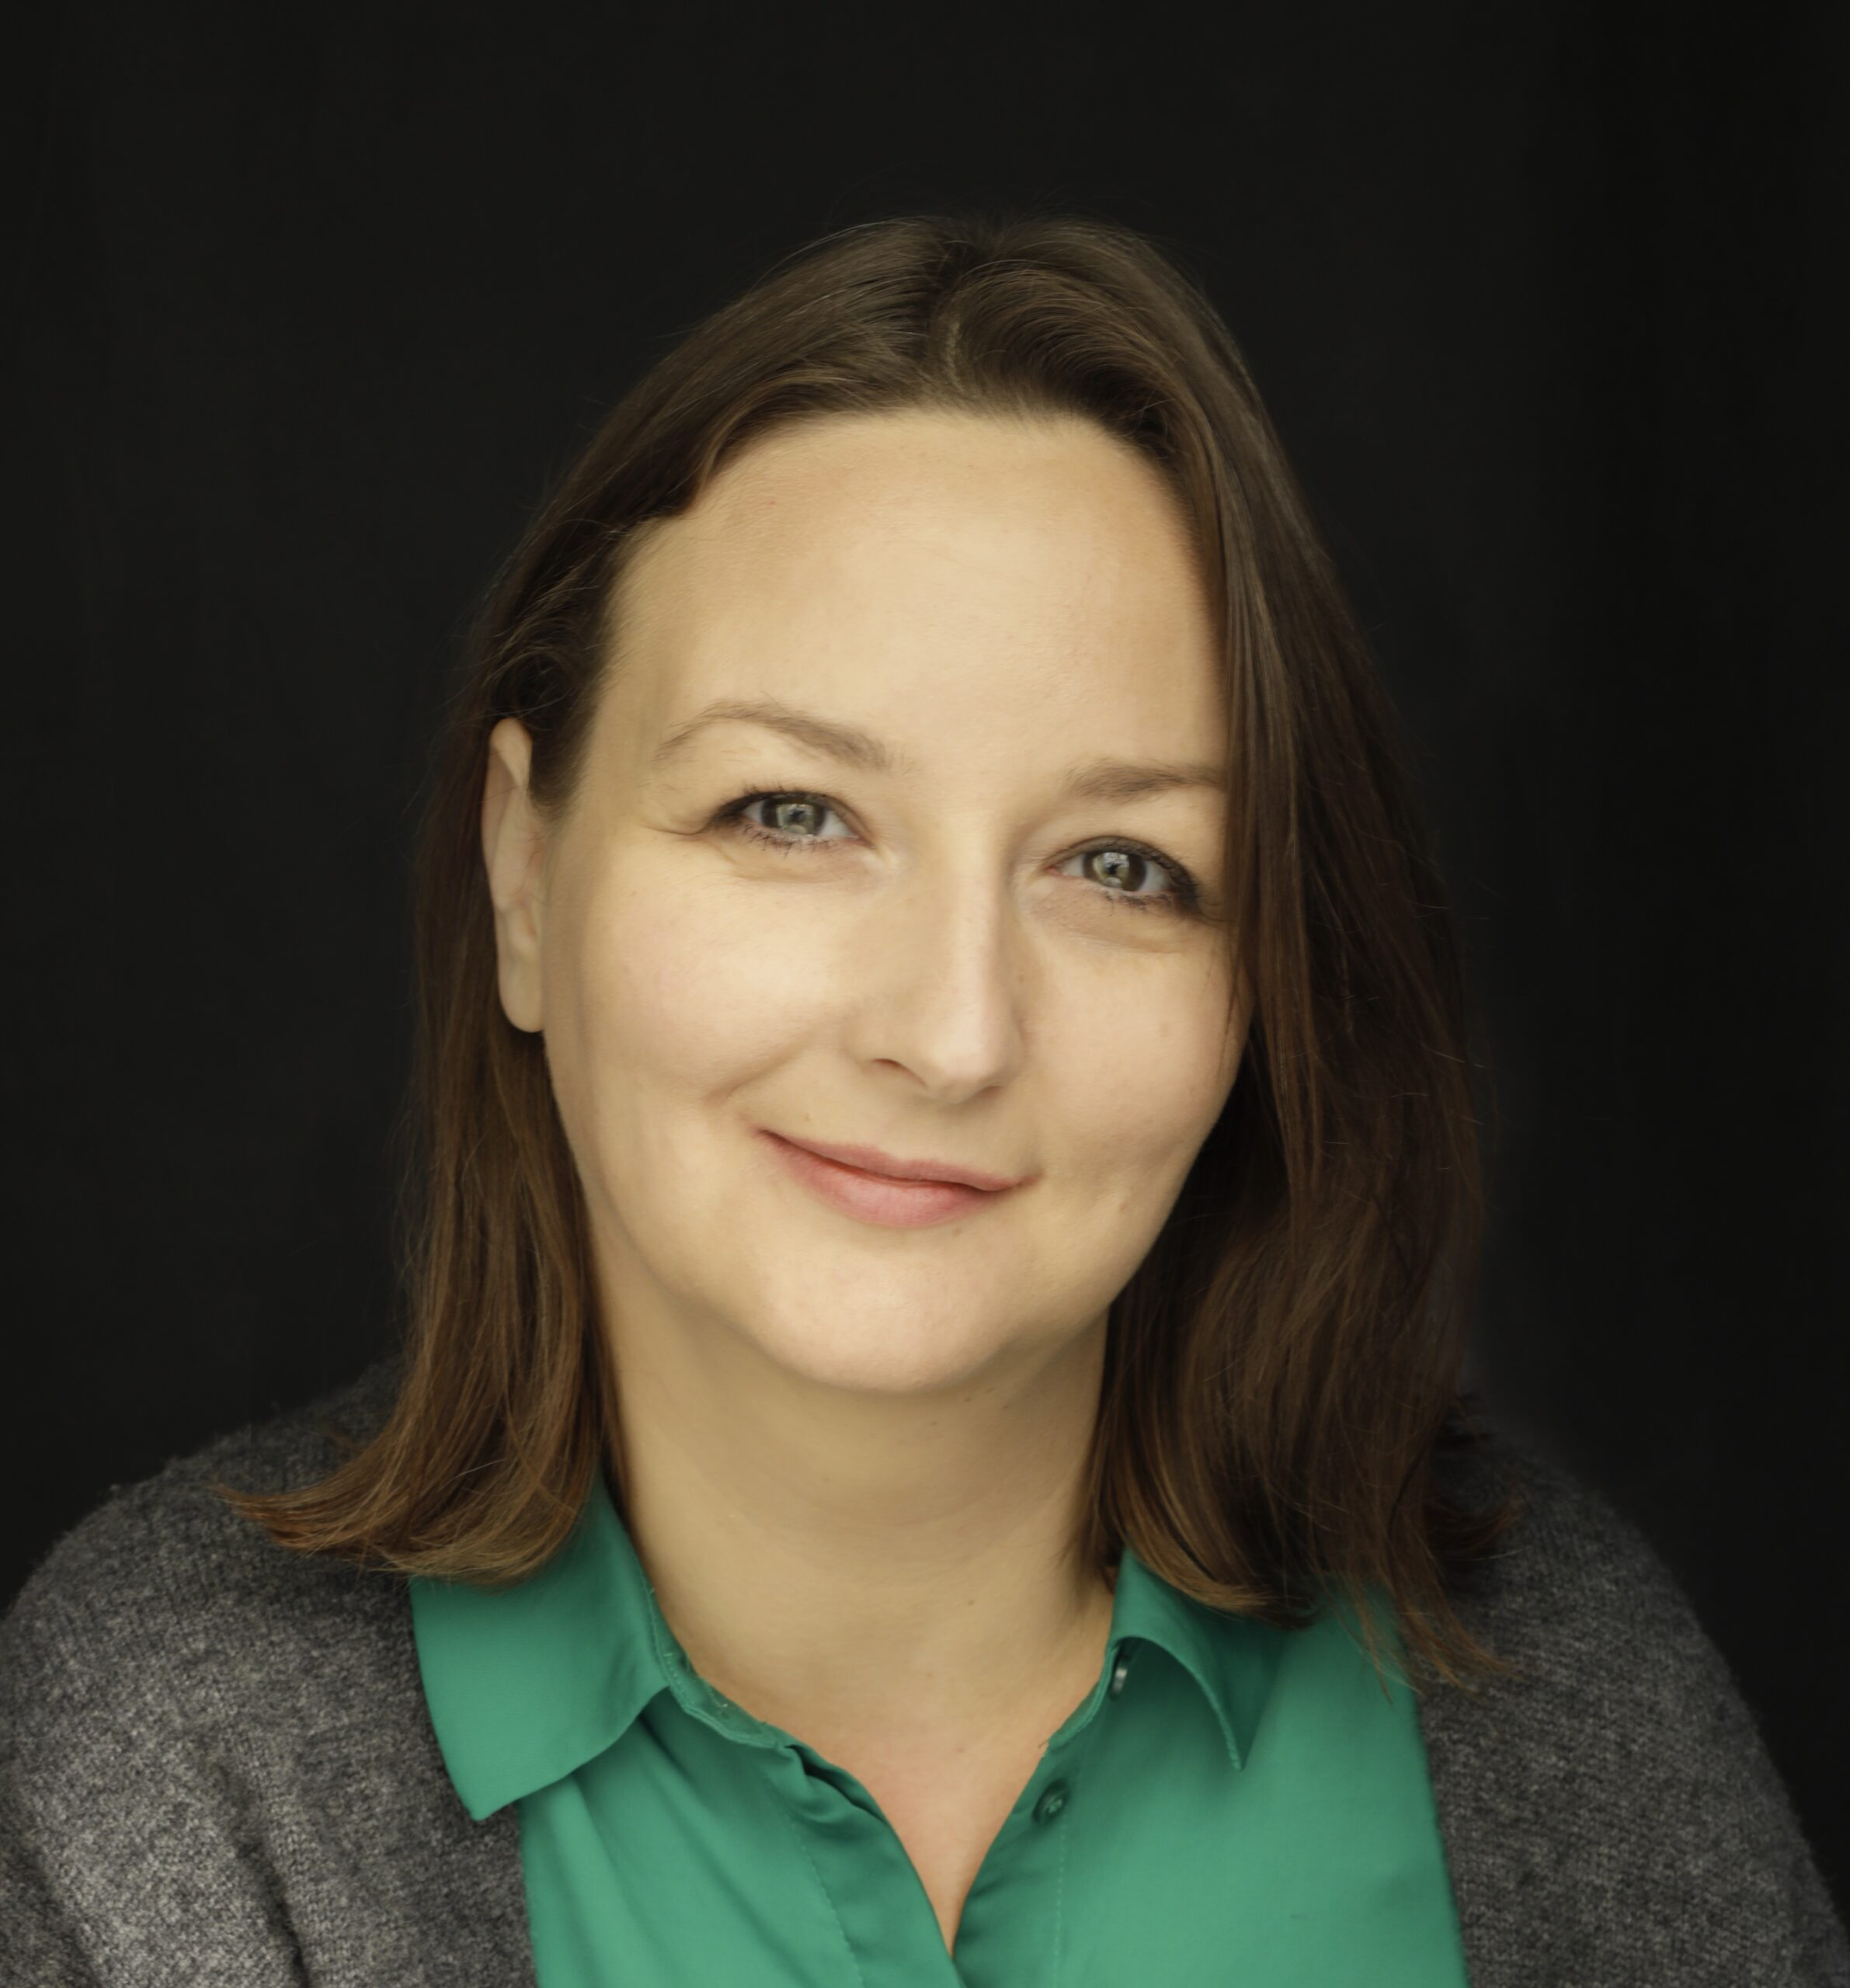 Ewa Cejner